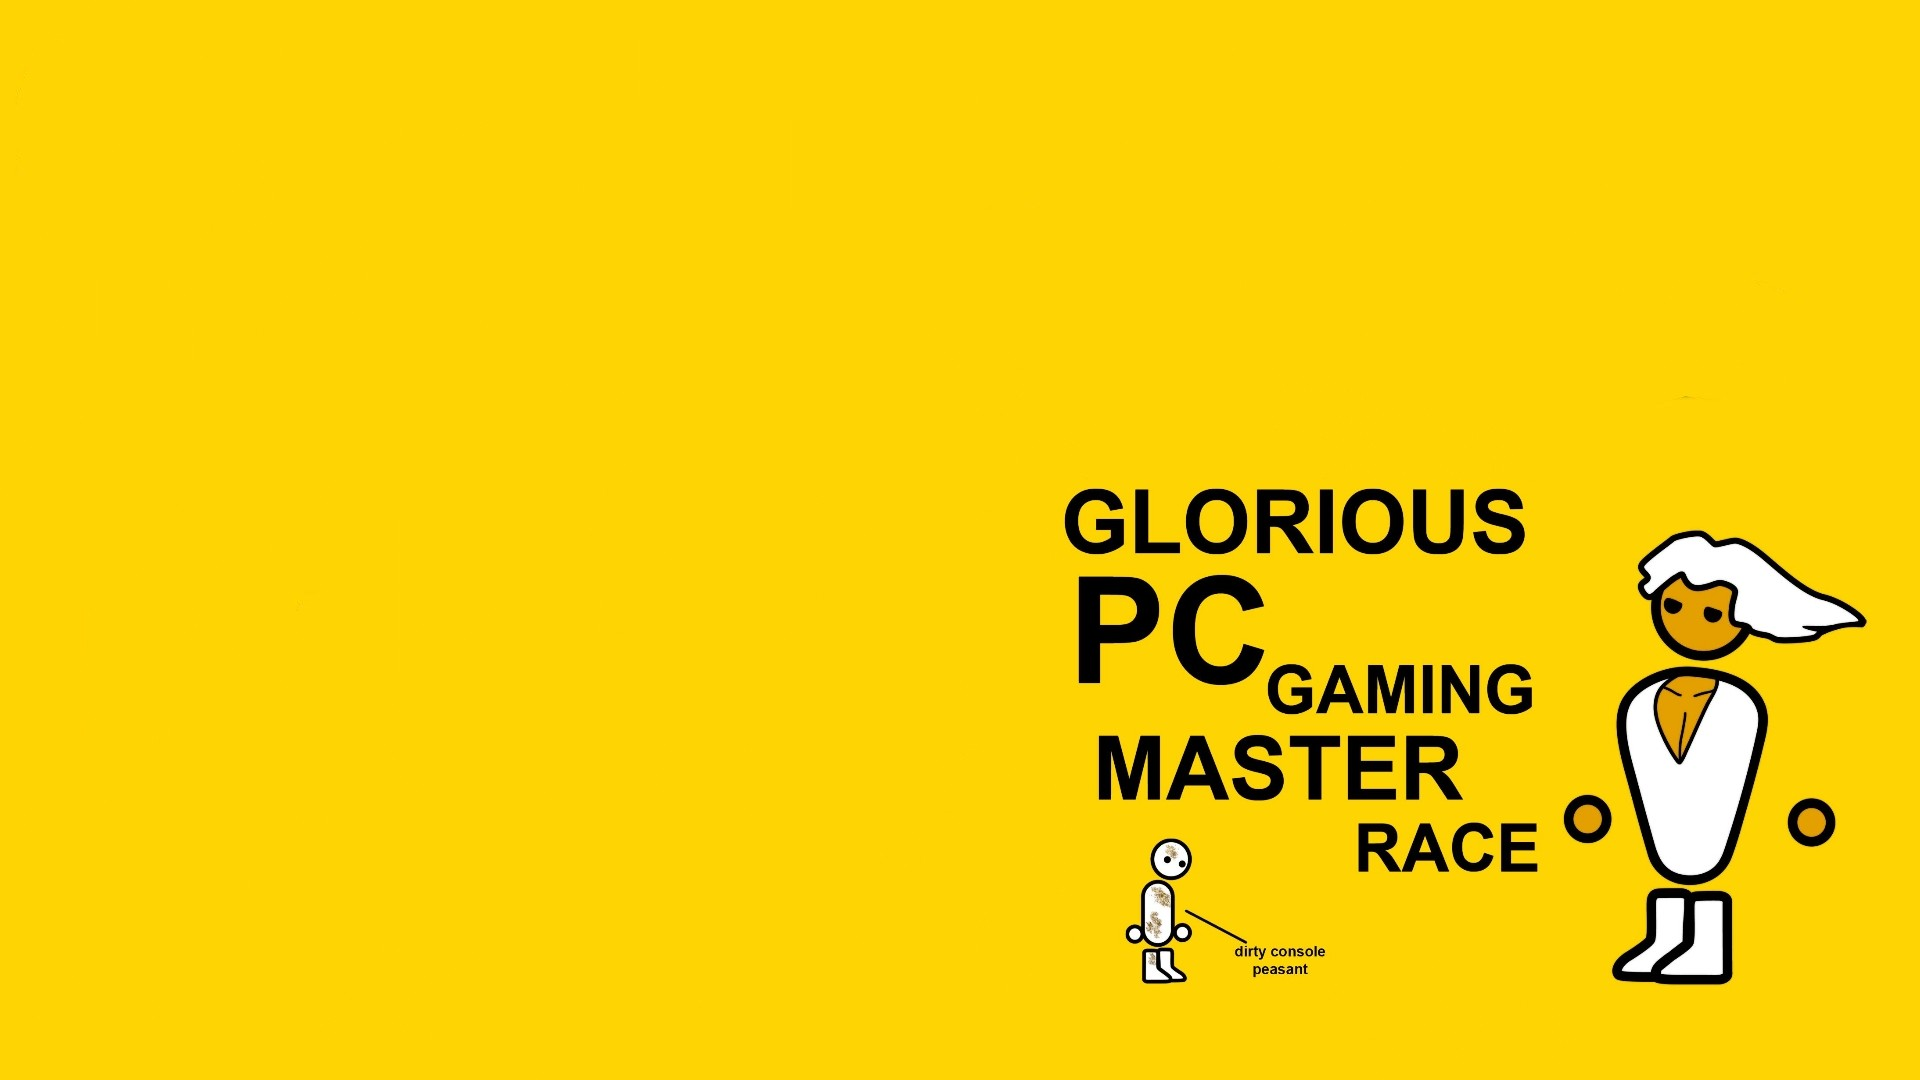 pcgamingmasterrace.jpg …